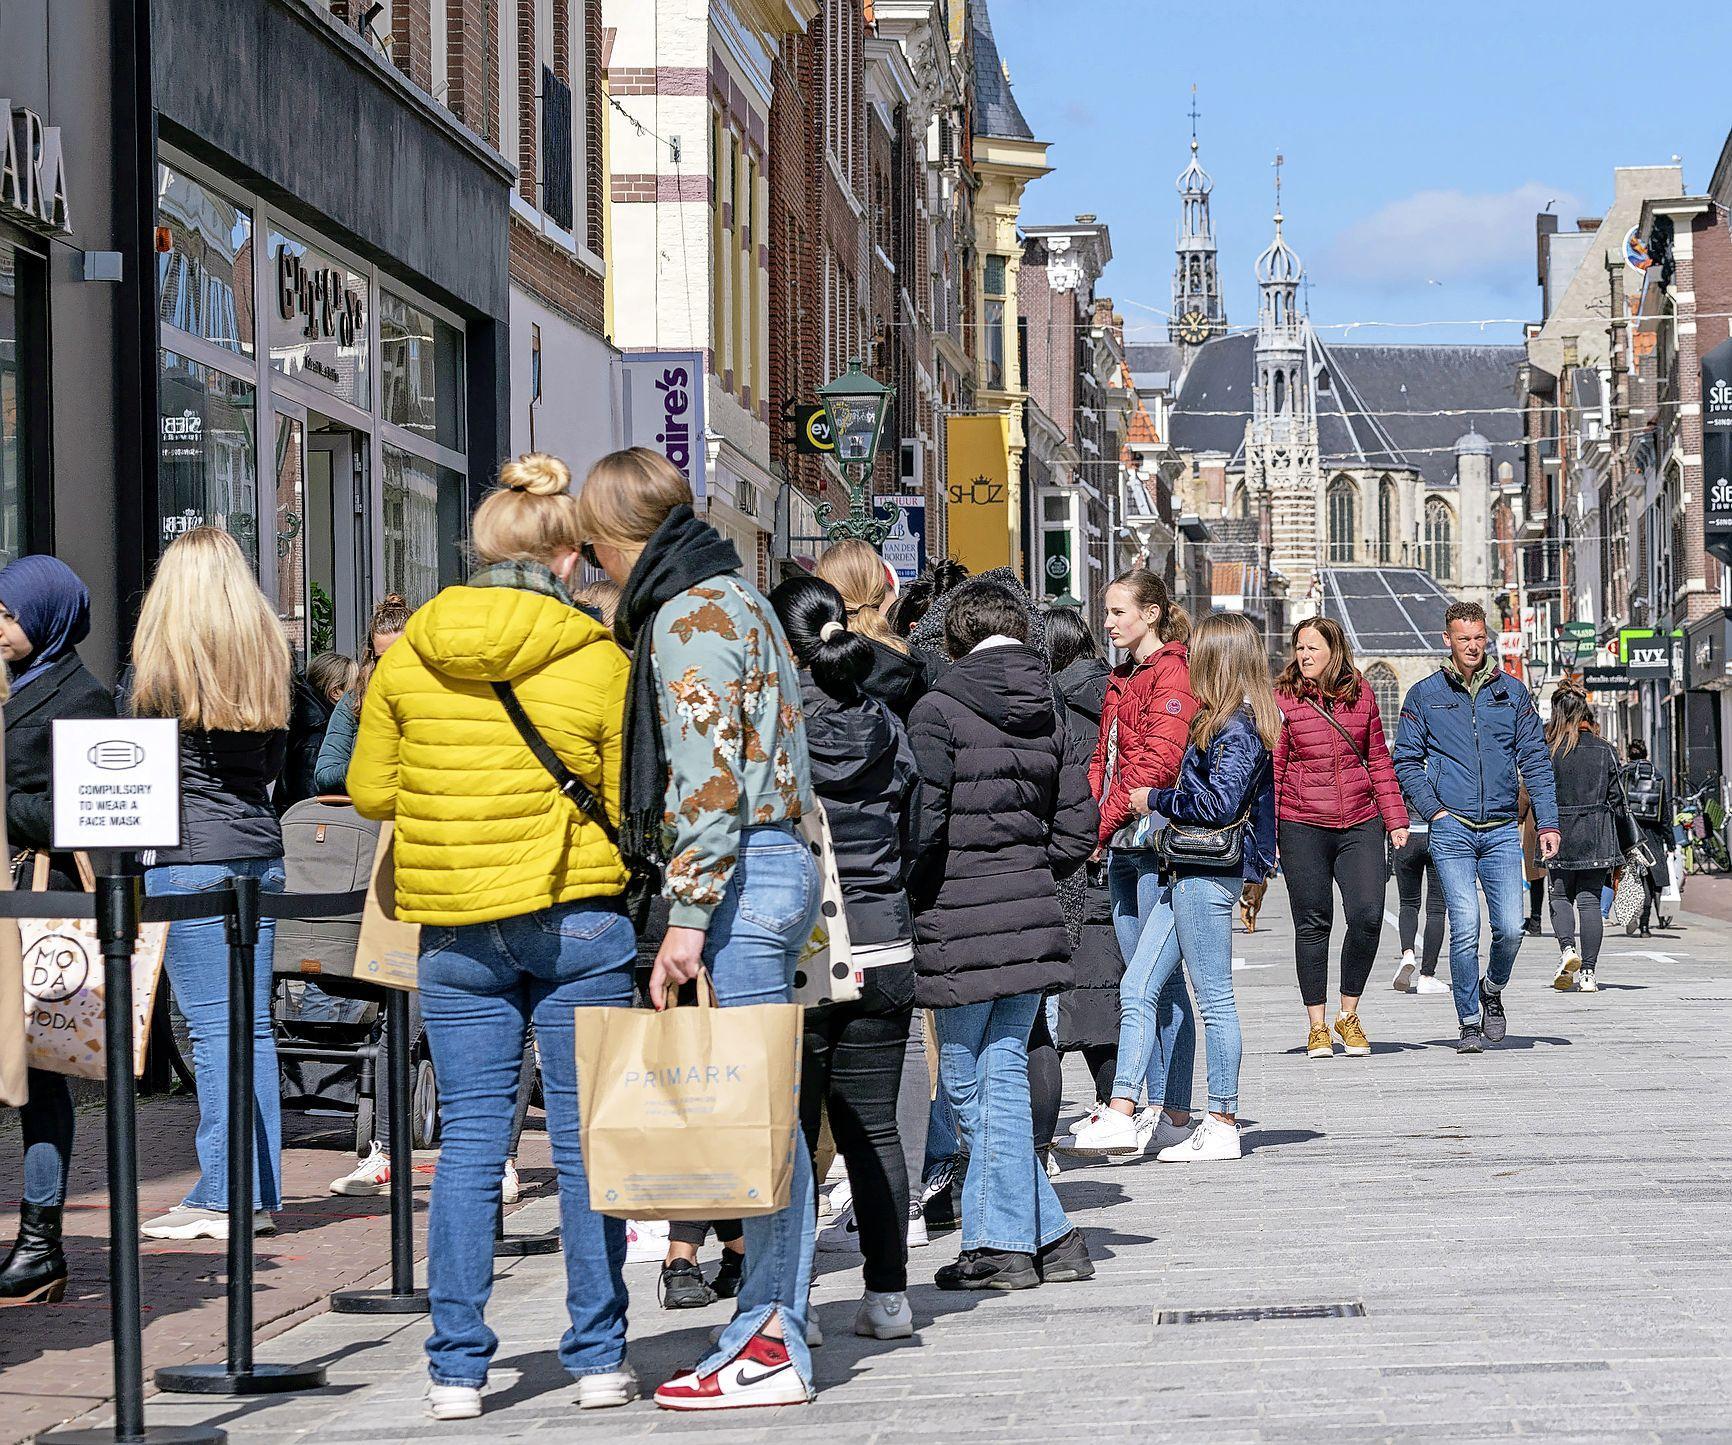 Het wordt te druk in winkelstad Alkmaar. Enorme rijen van shoppers. Ondernemers doen oproep: 'Kom 's ochtends, dan is het nog lekker rustig'